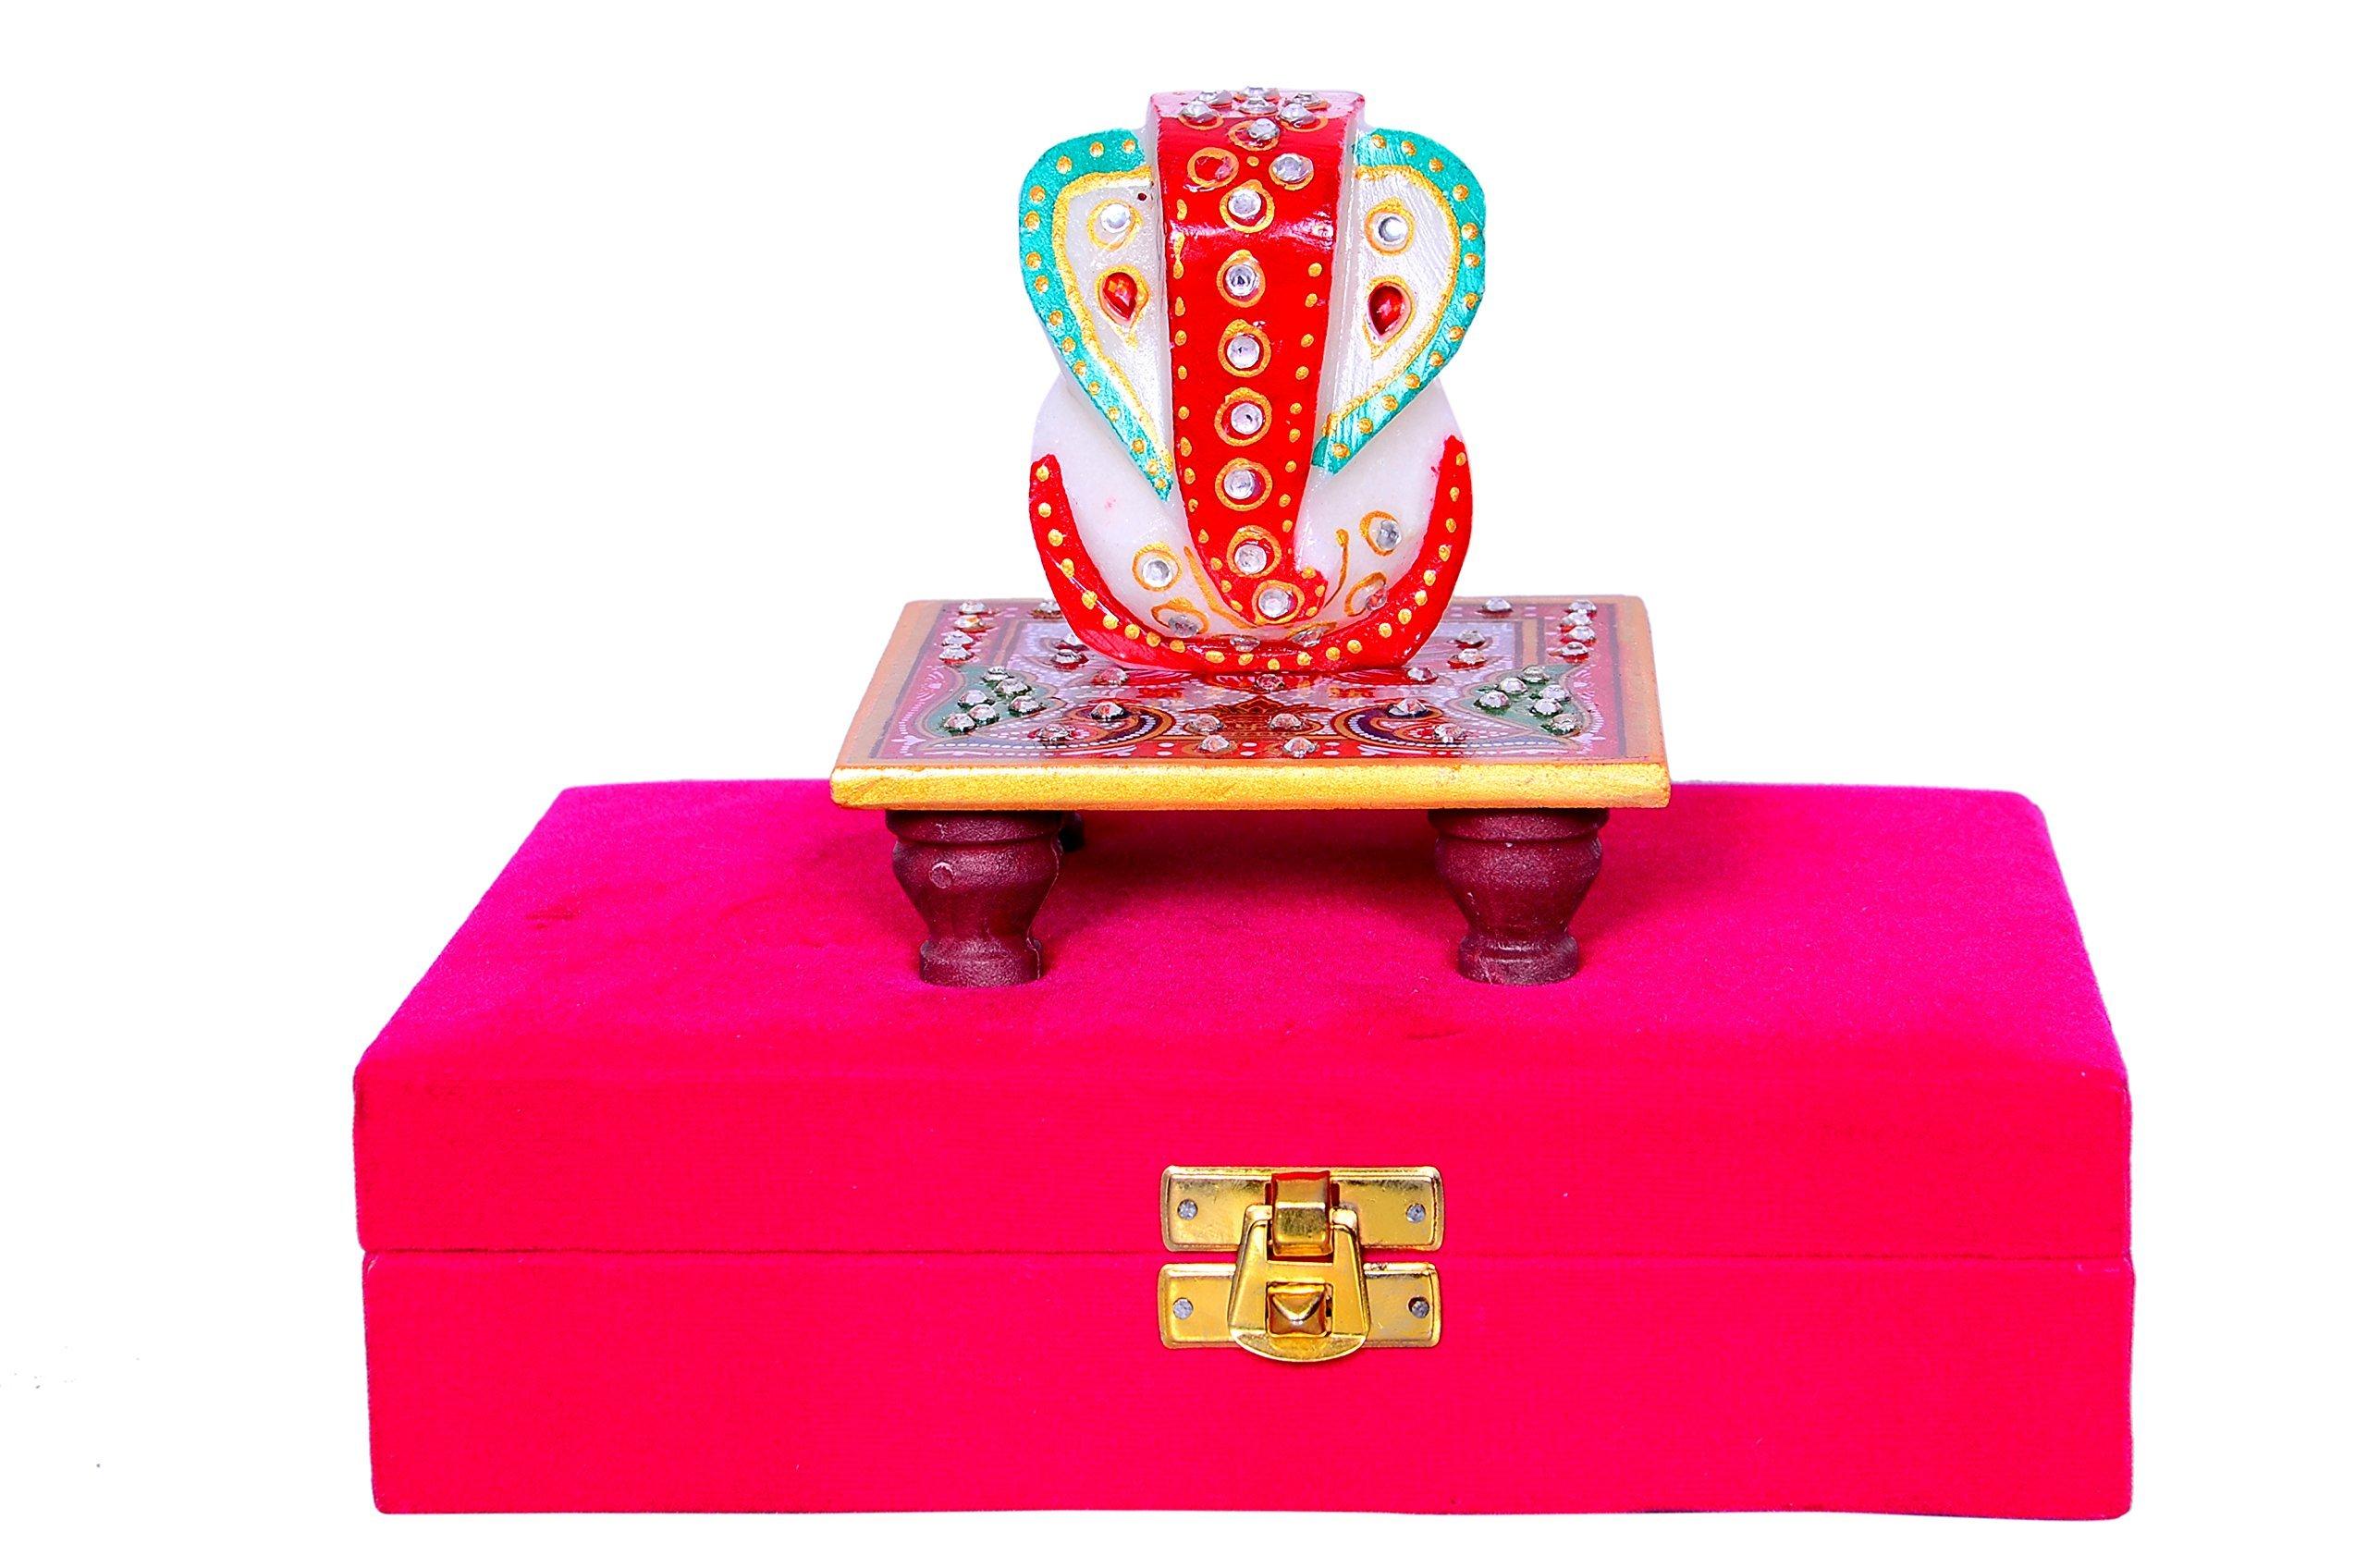 Gift Hamper 'India Traditions': Marble Ganesha (Ganapathi, Ganesh Or Vinayak) Statue In Velvet Box